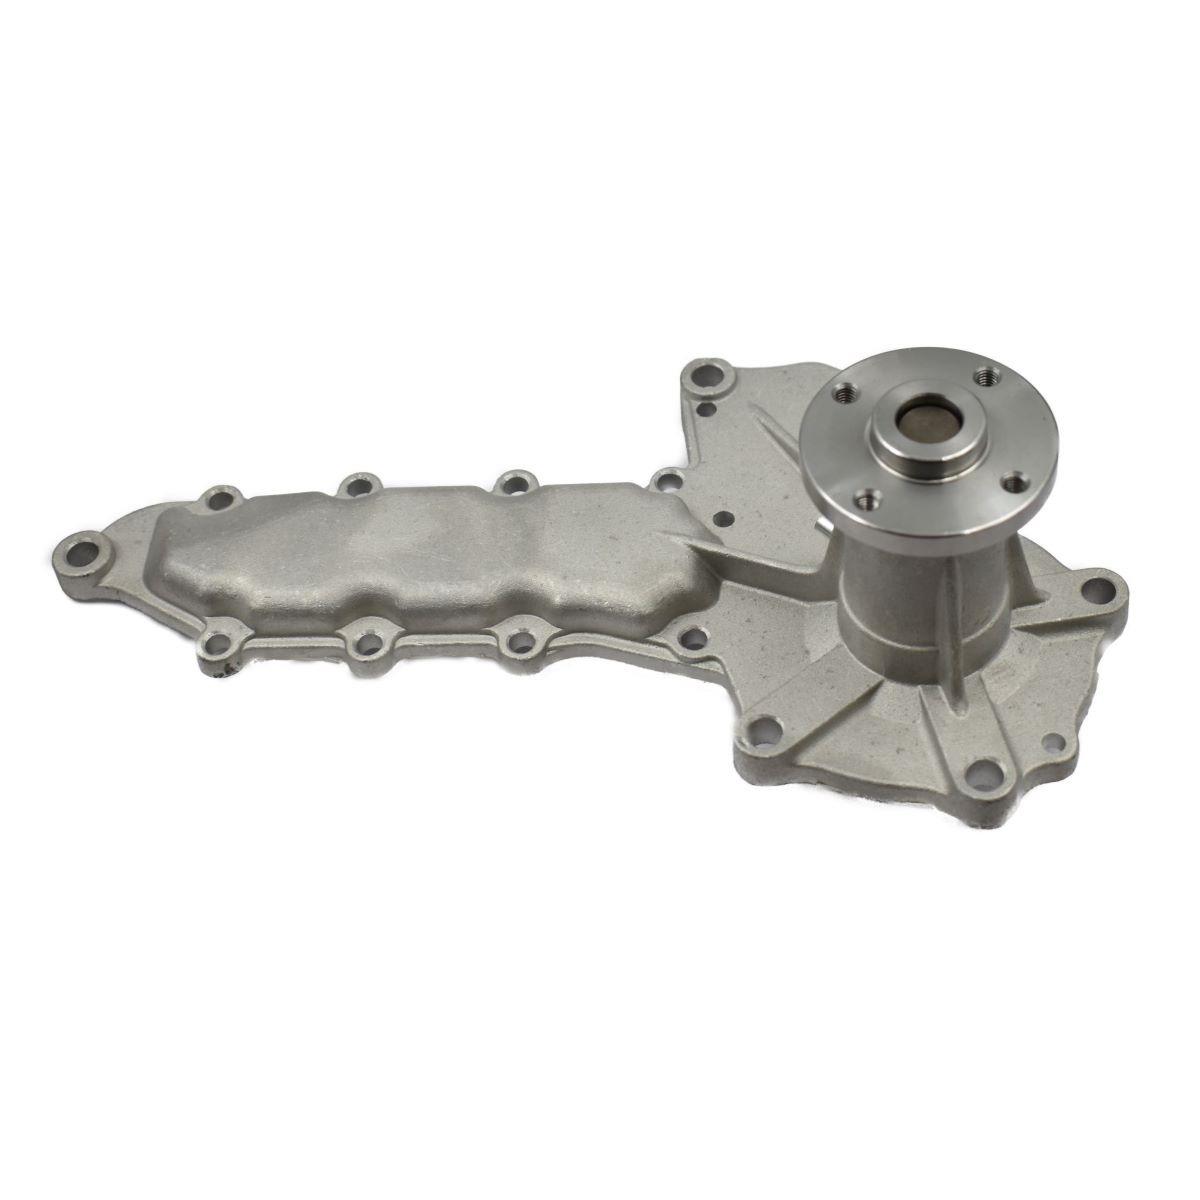 Kubota: L235 L275 L355 L1802 L2002 L2402 L2900 L2950 L3250 L3300 L3350 L3450 L3600 L3650 L4200 L4350 L4850 L5450 Kubota: B1902 L1-185 L1-195 L1-205 L1-215 L1-215 L1-225 L12355 L1-245 275 Kubota engine: V1702 V1702T V1702E